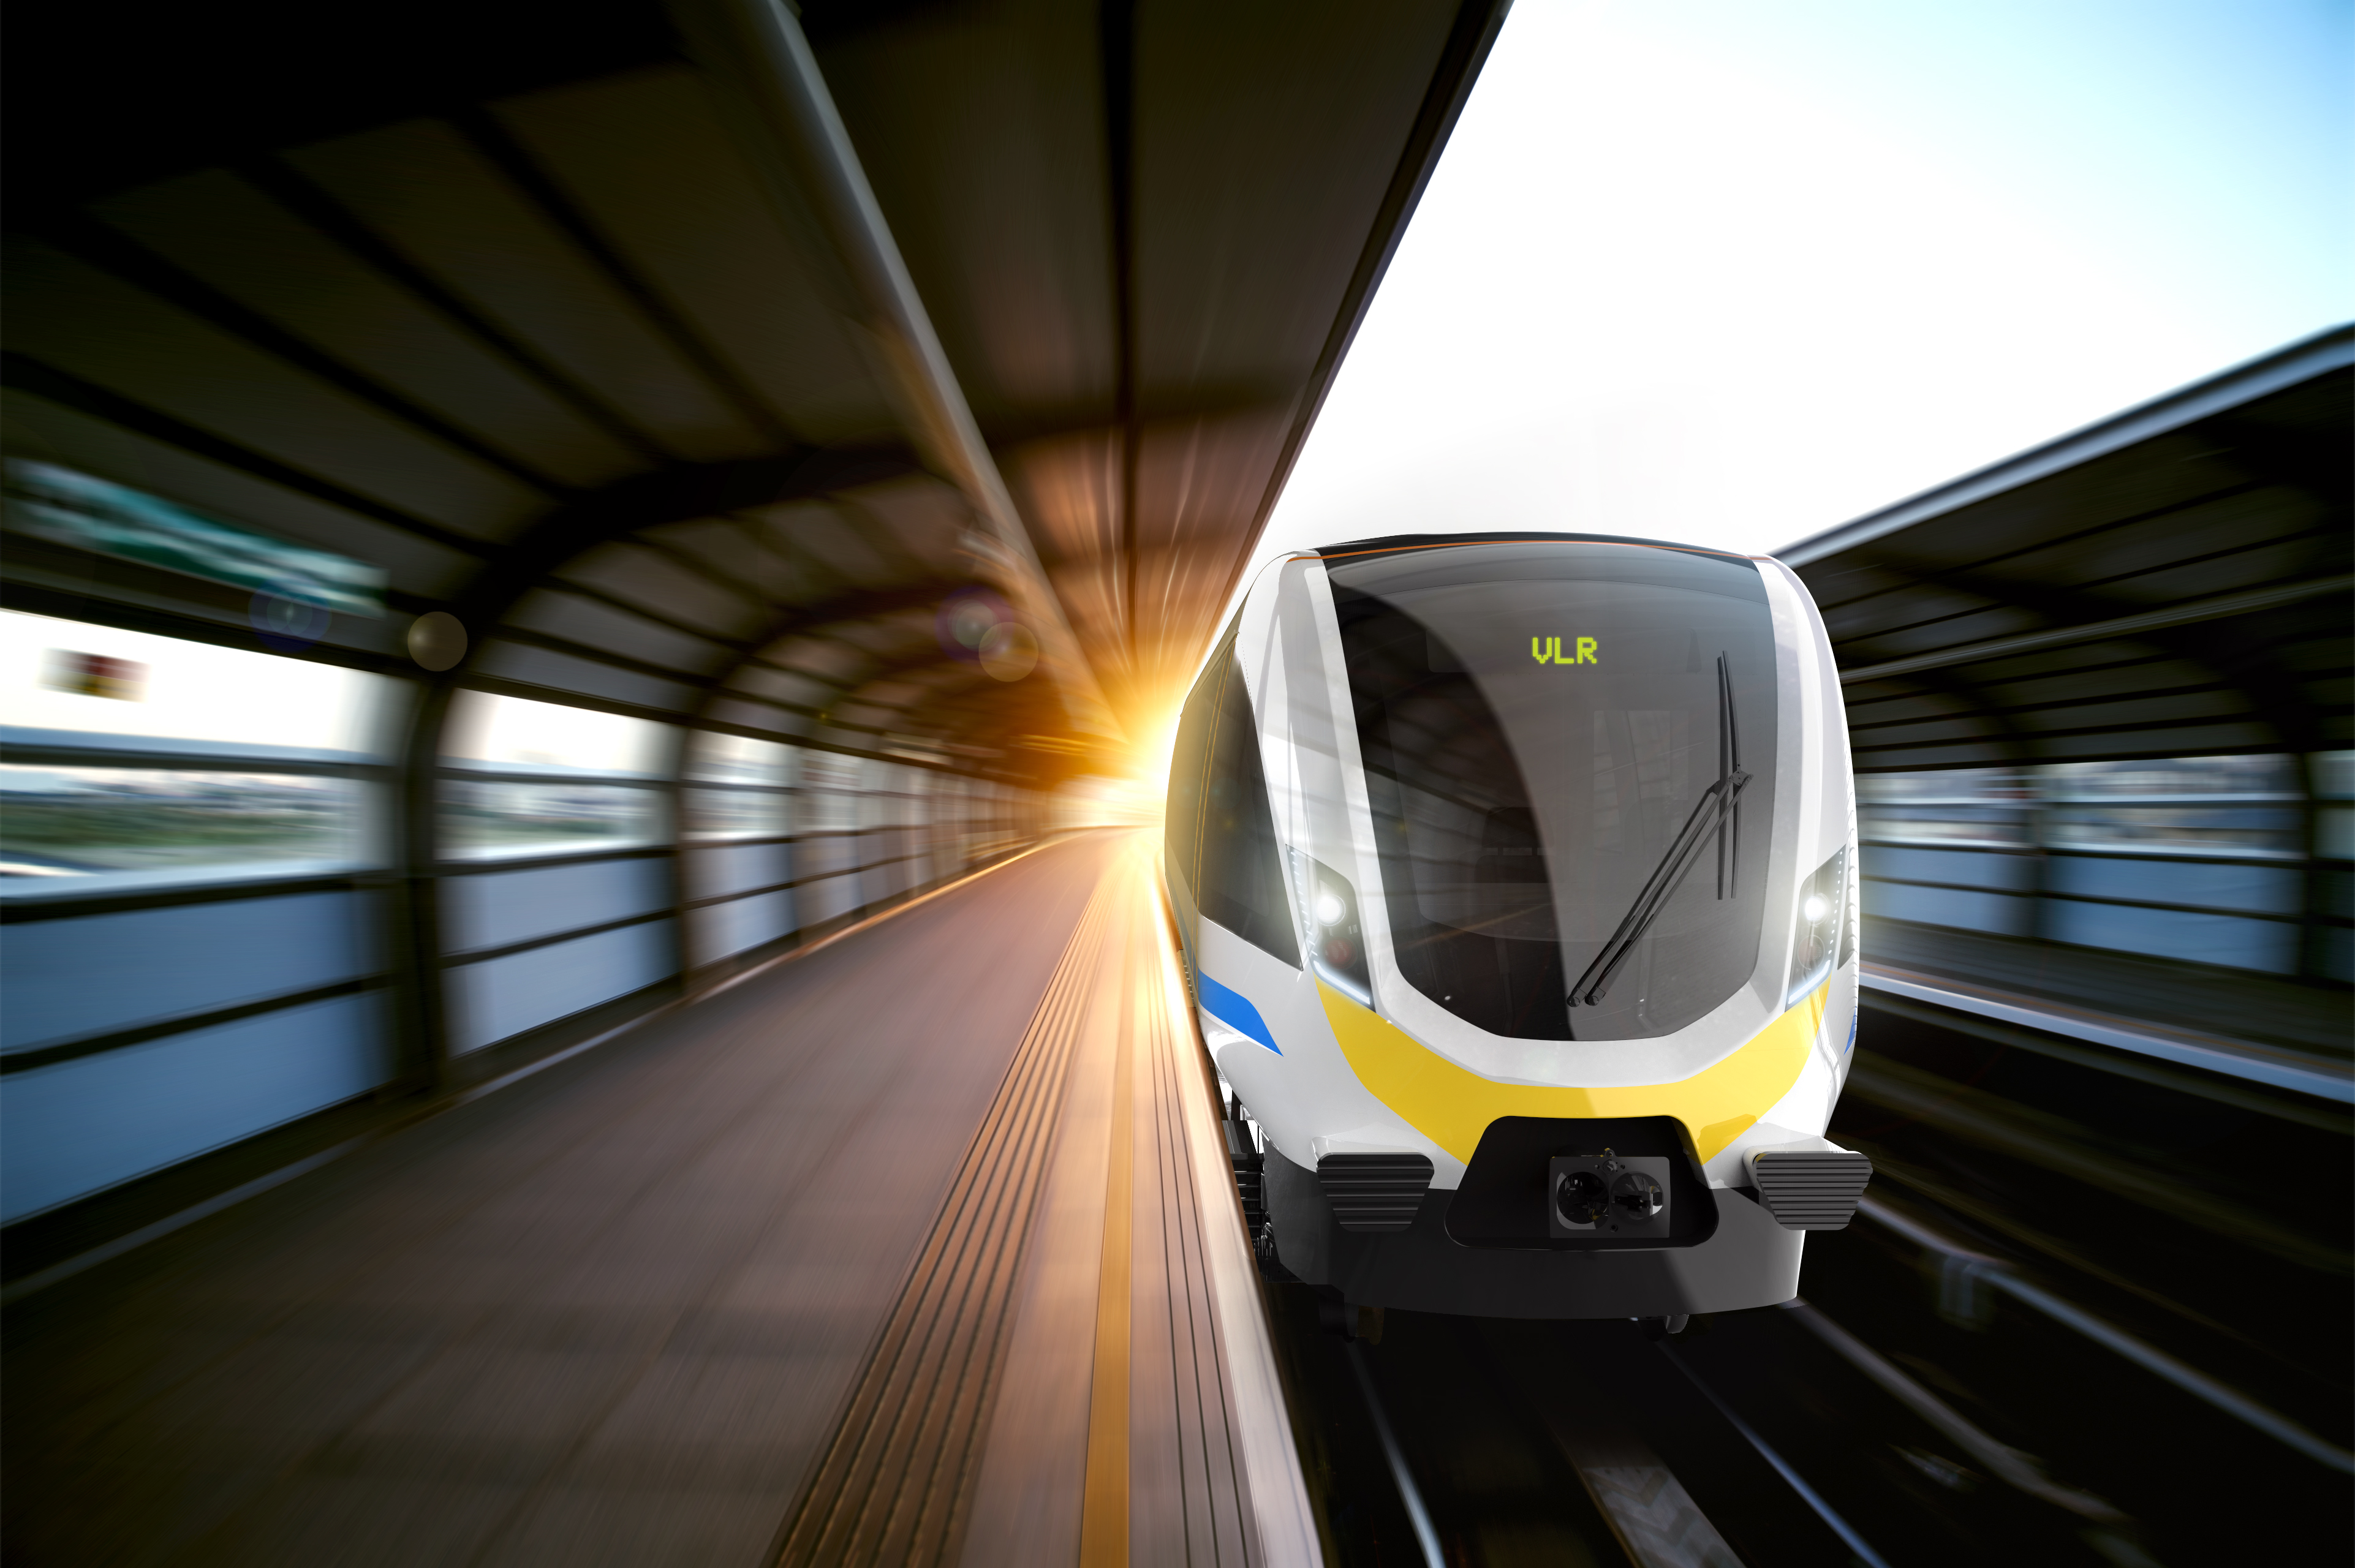 Revolution Very Light Rail